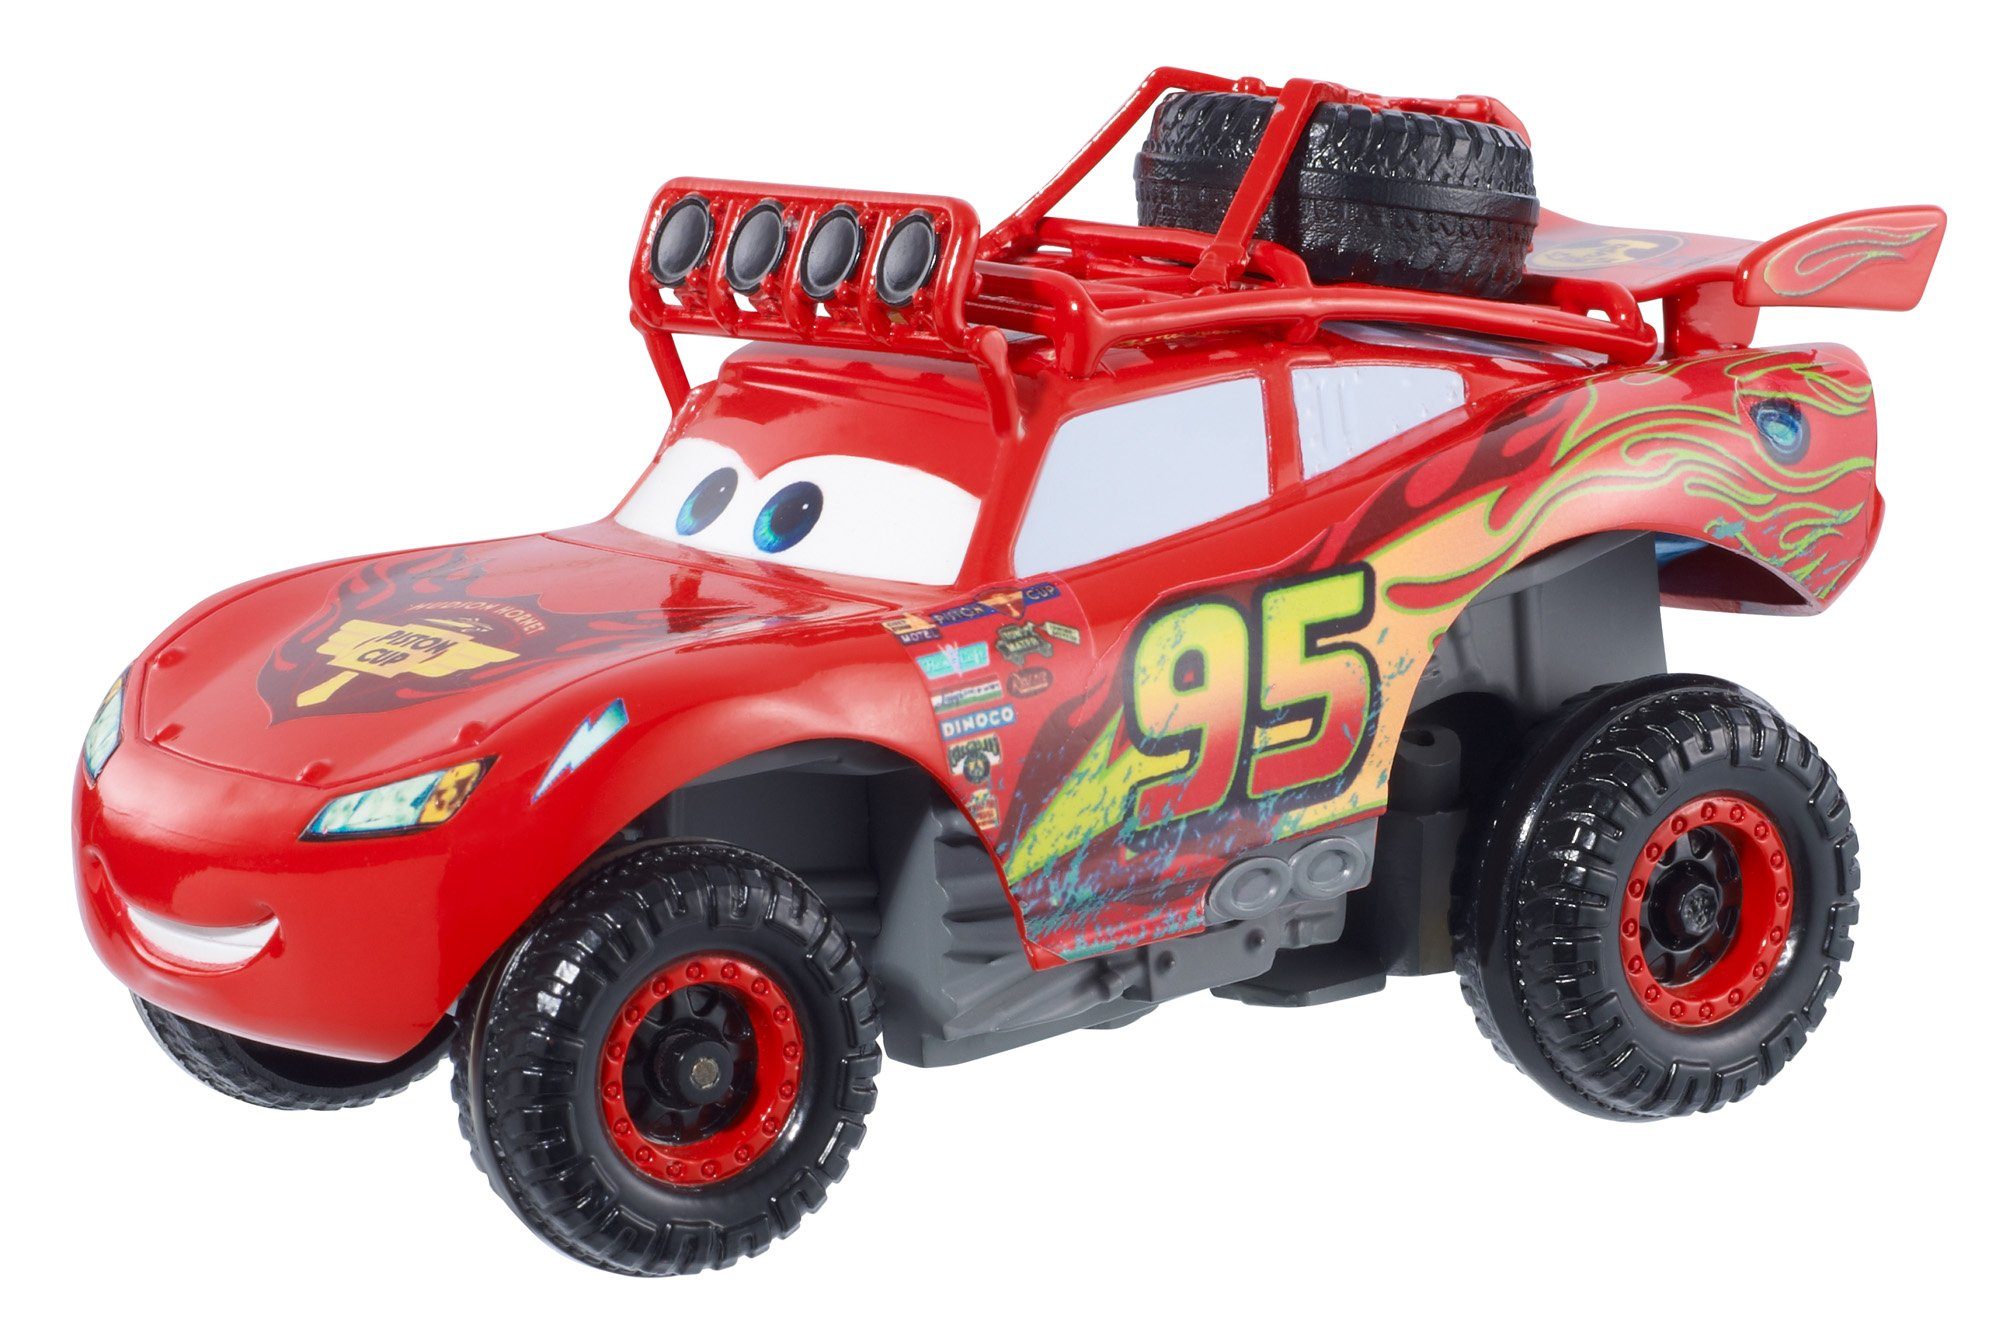 Disney/Pixar Cars Radiator Springs 500 1/2 Wild Racer Lightning McQueen Pullback Vehicle